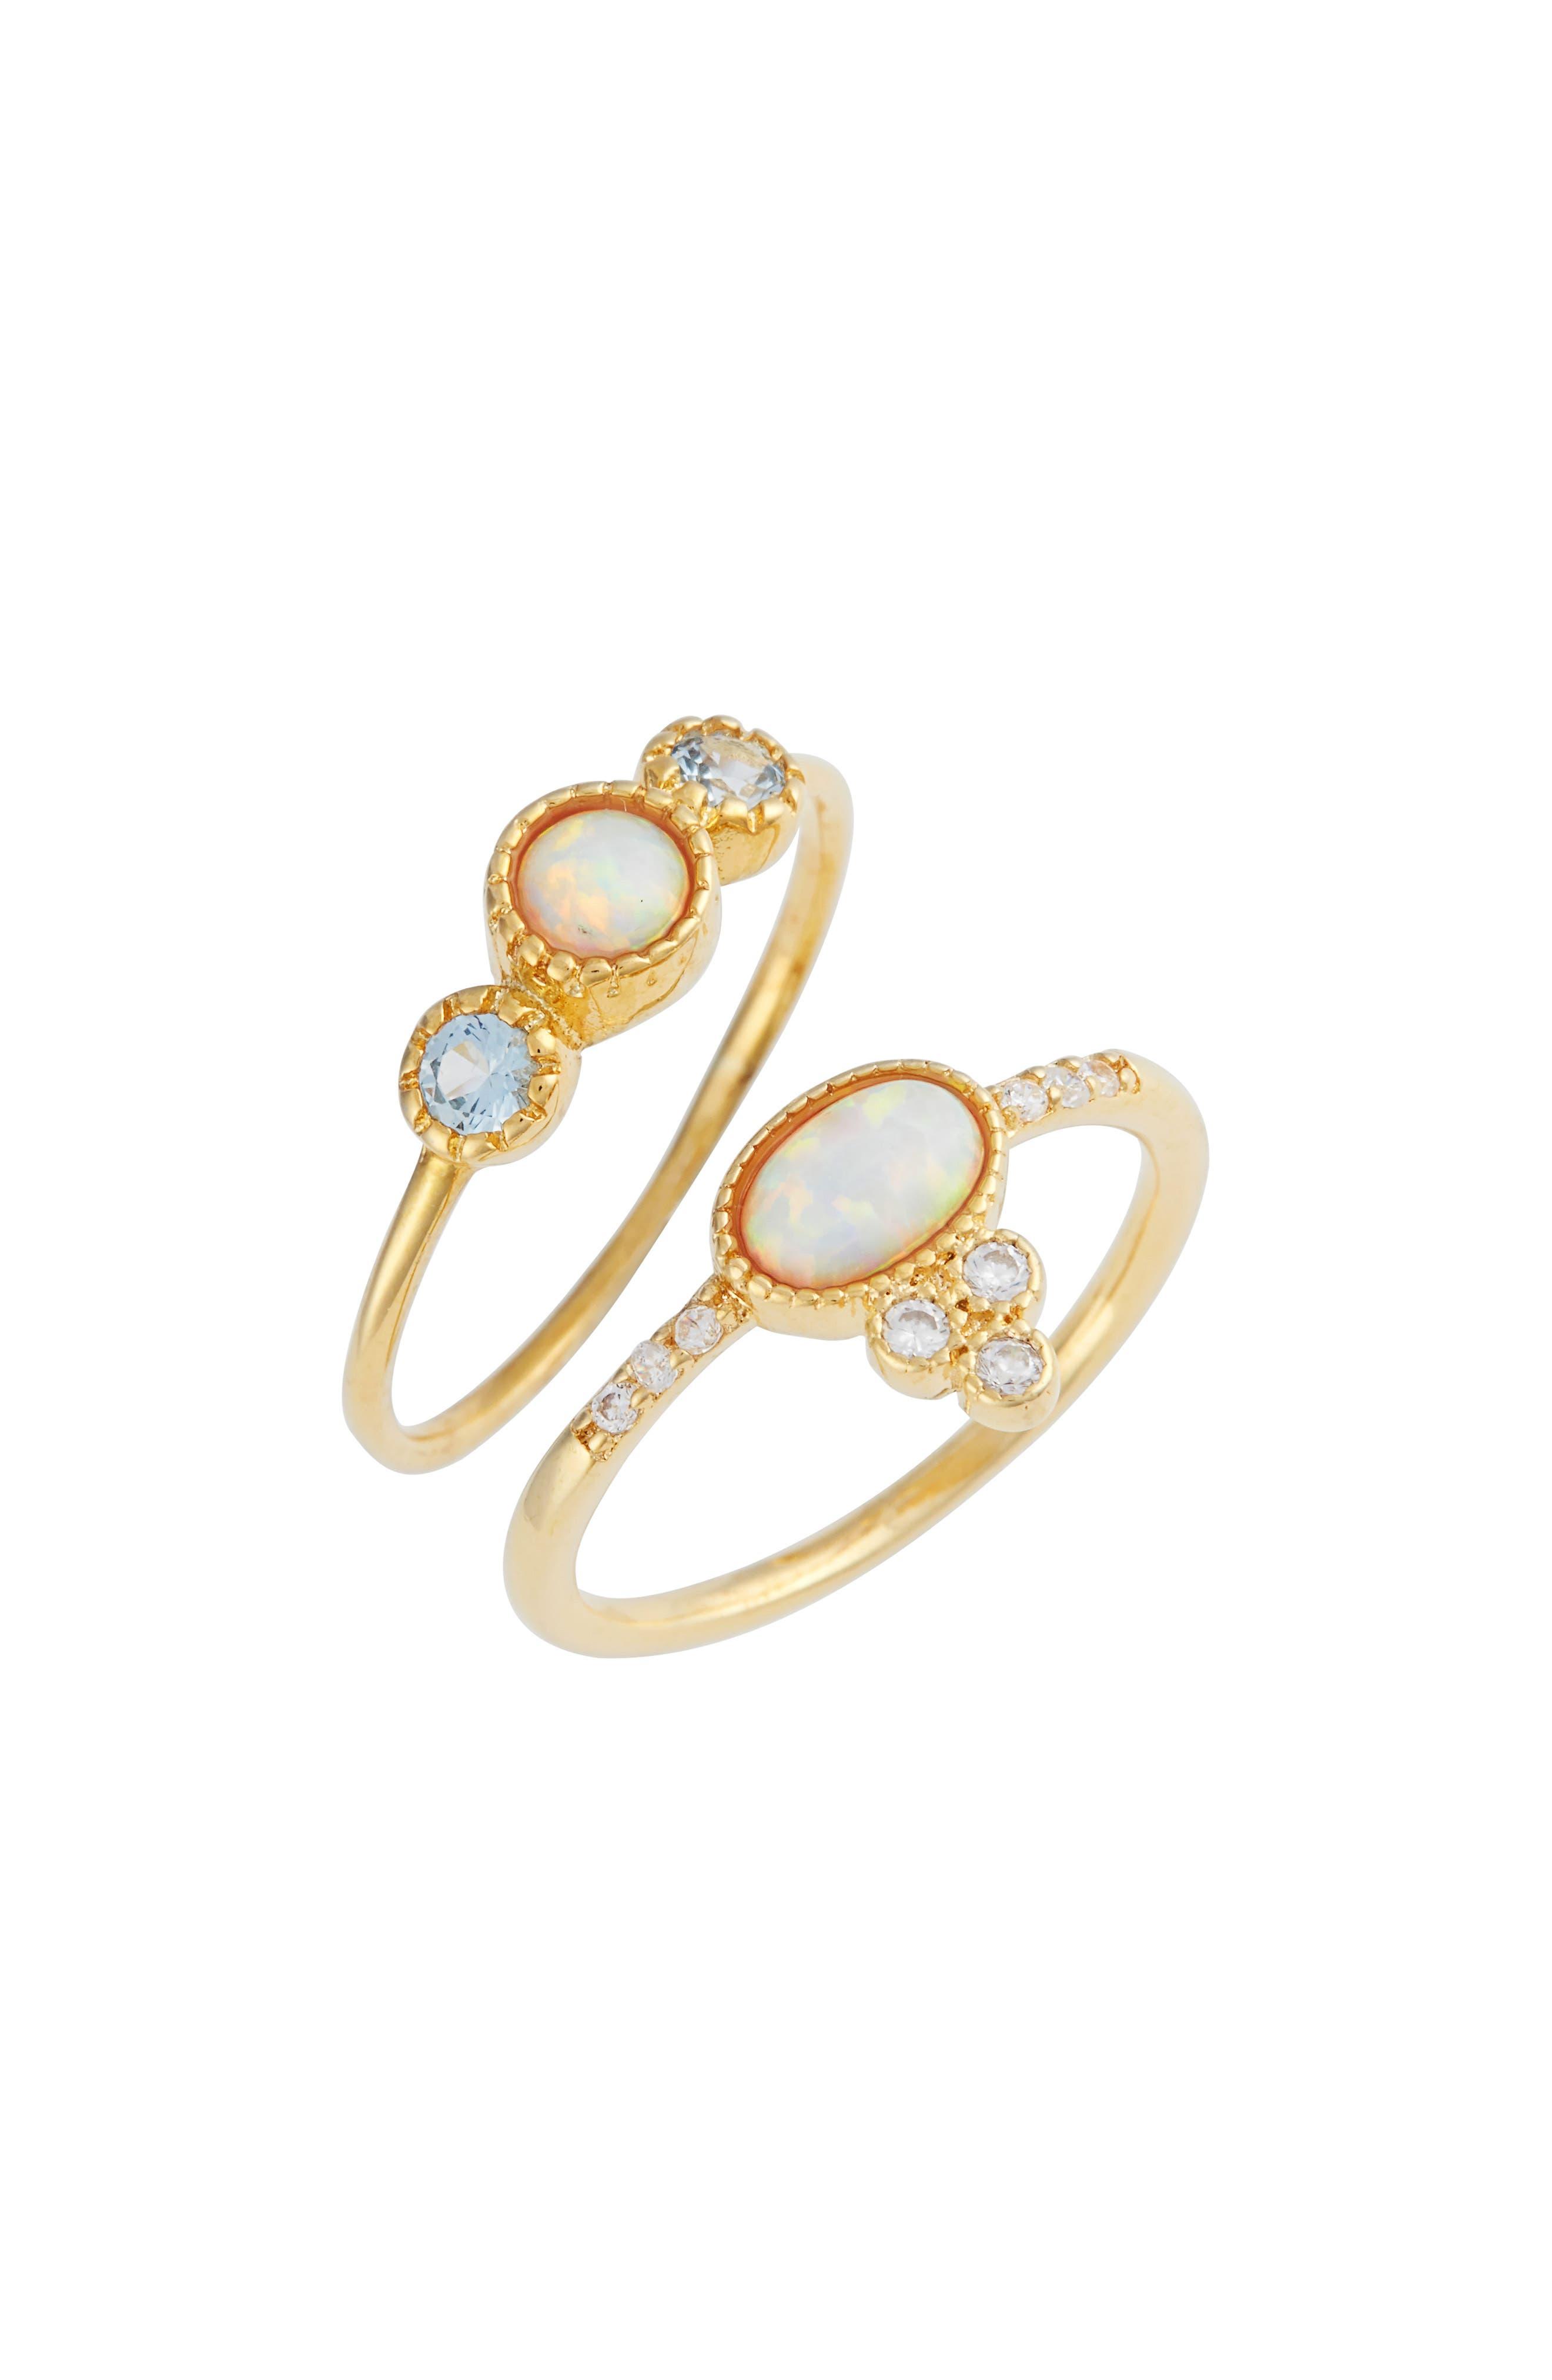 Fabiana Set of 2 Fire Opal & Crystal Rings,                         Main,                         color,